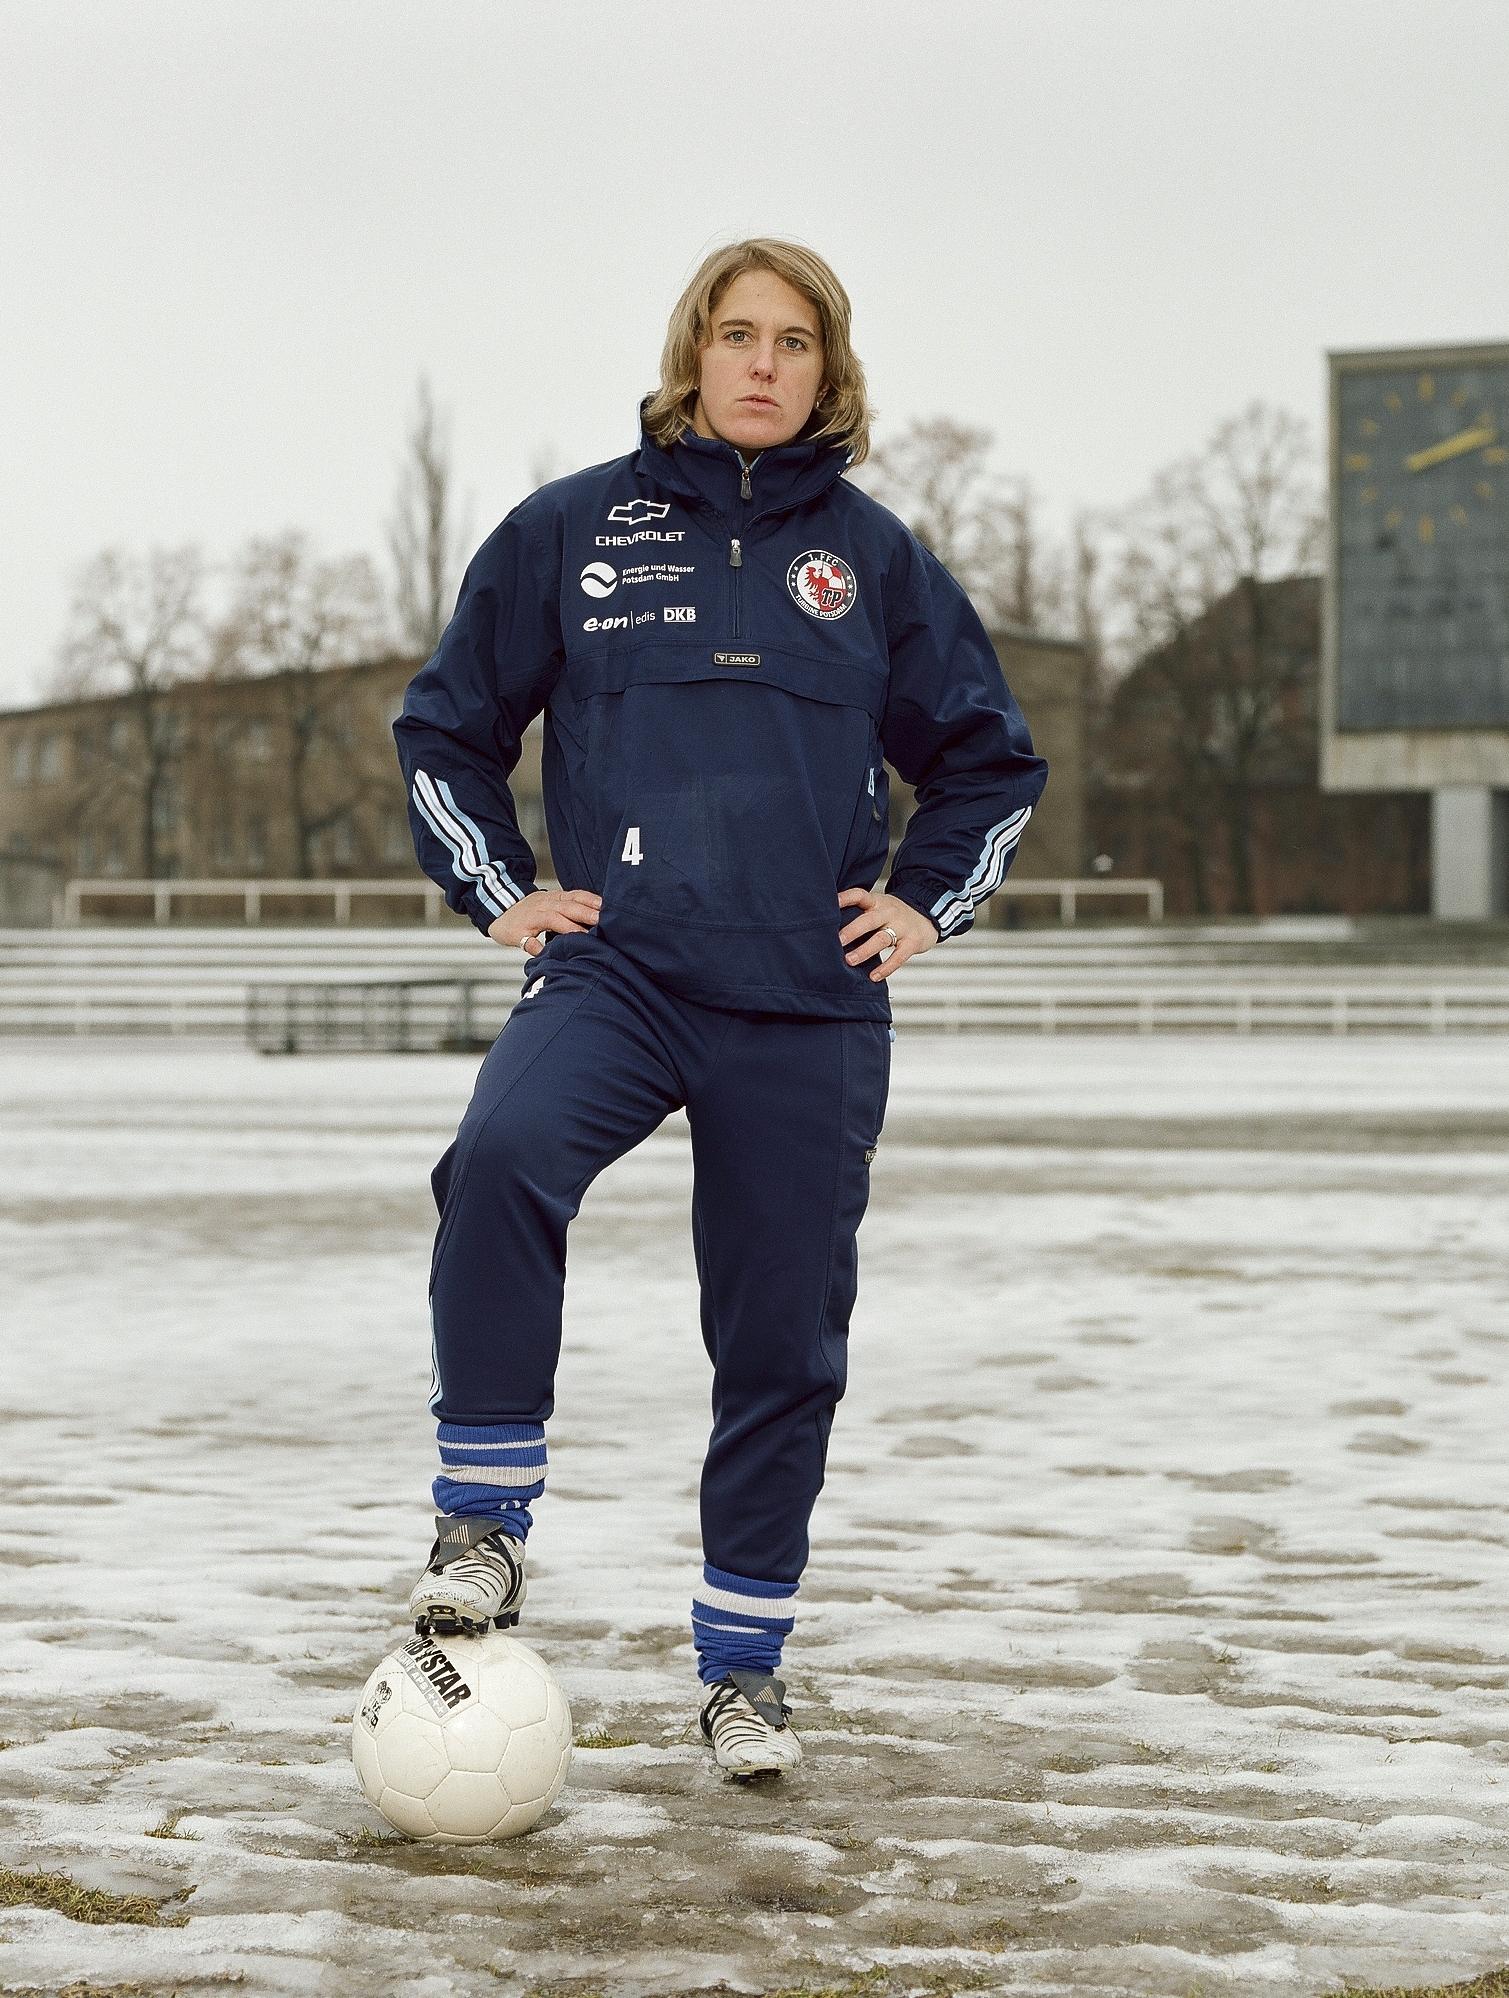 Britta Carlson, player in the German national team, Potsdam